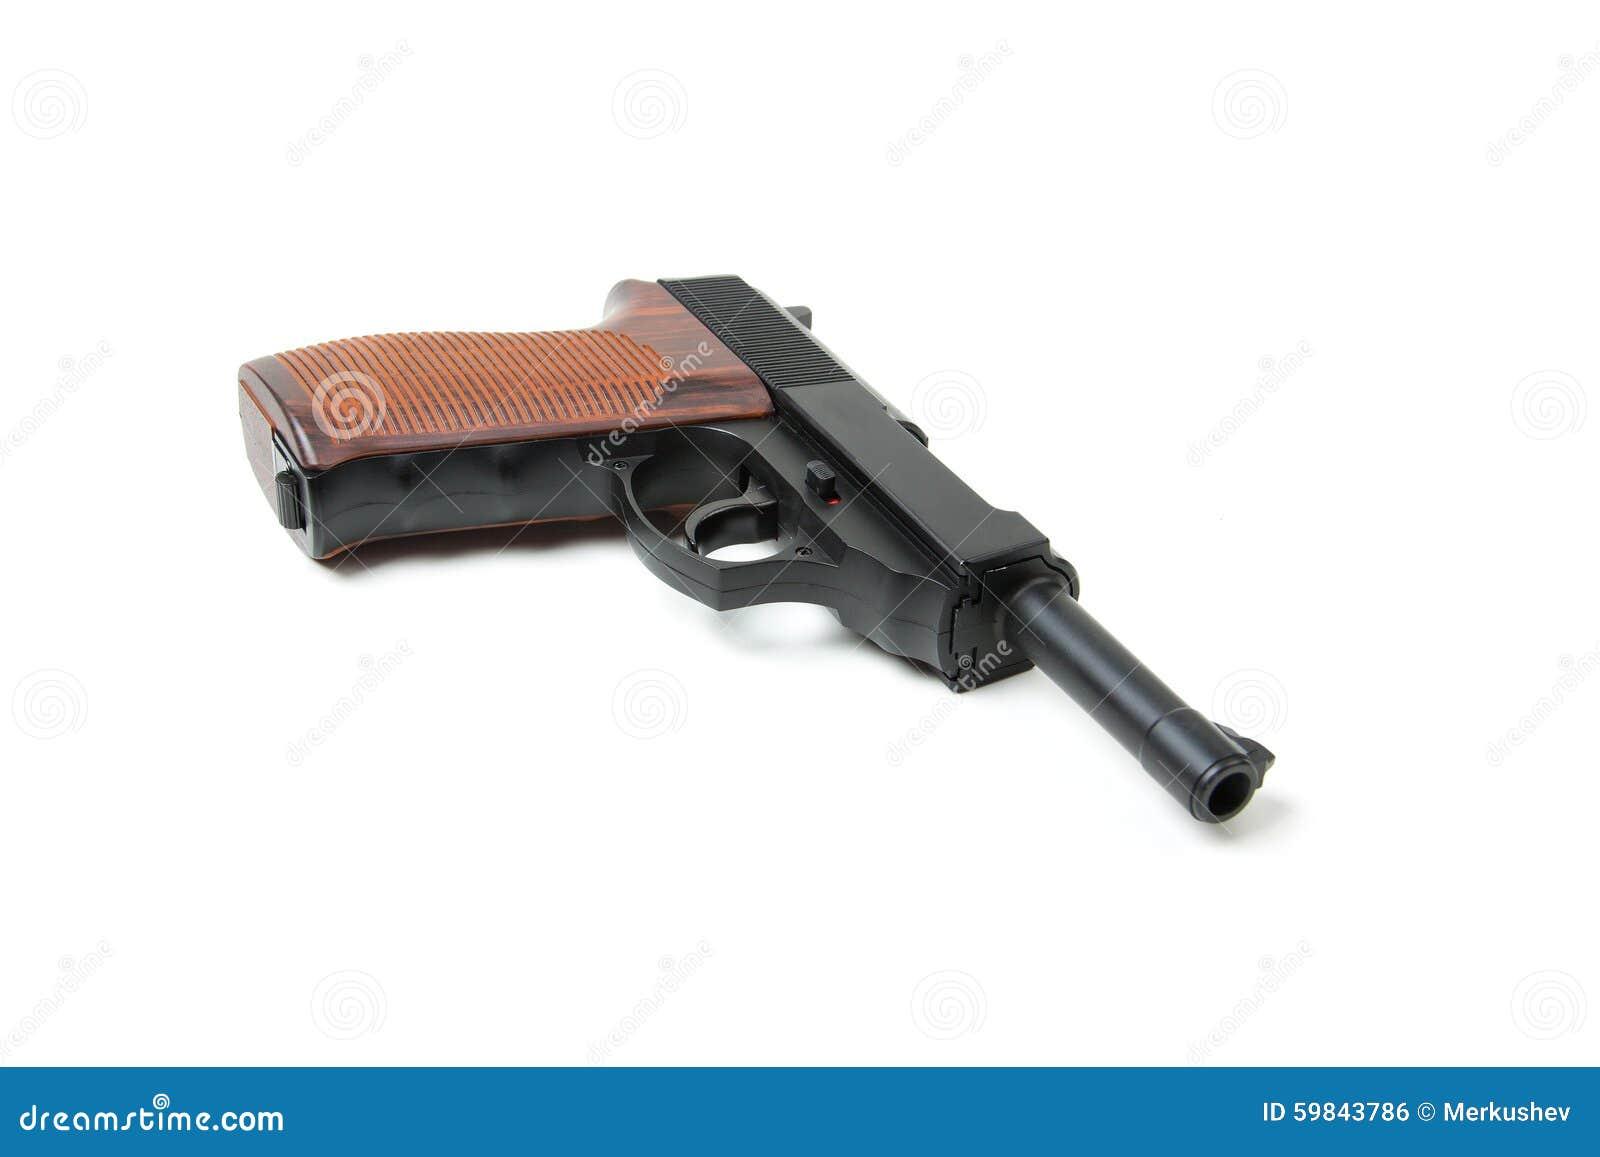 gun white background - photo #33